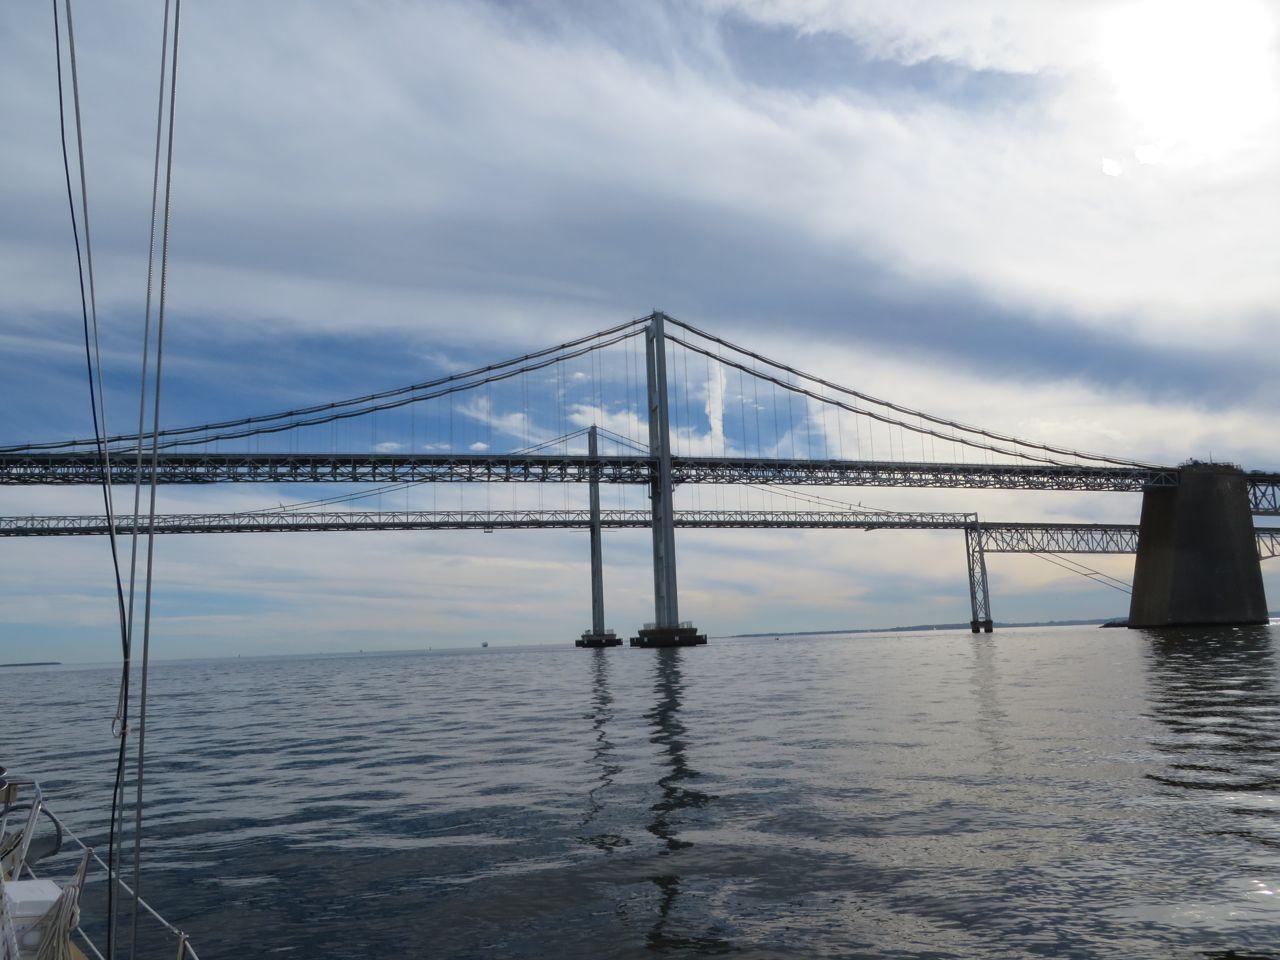 48+] Chesapeake Bay Bridge Wallpaper on WallpaperSafari